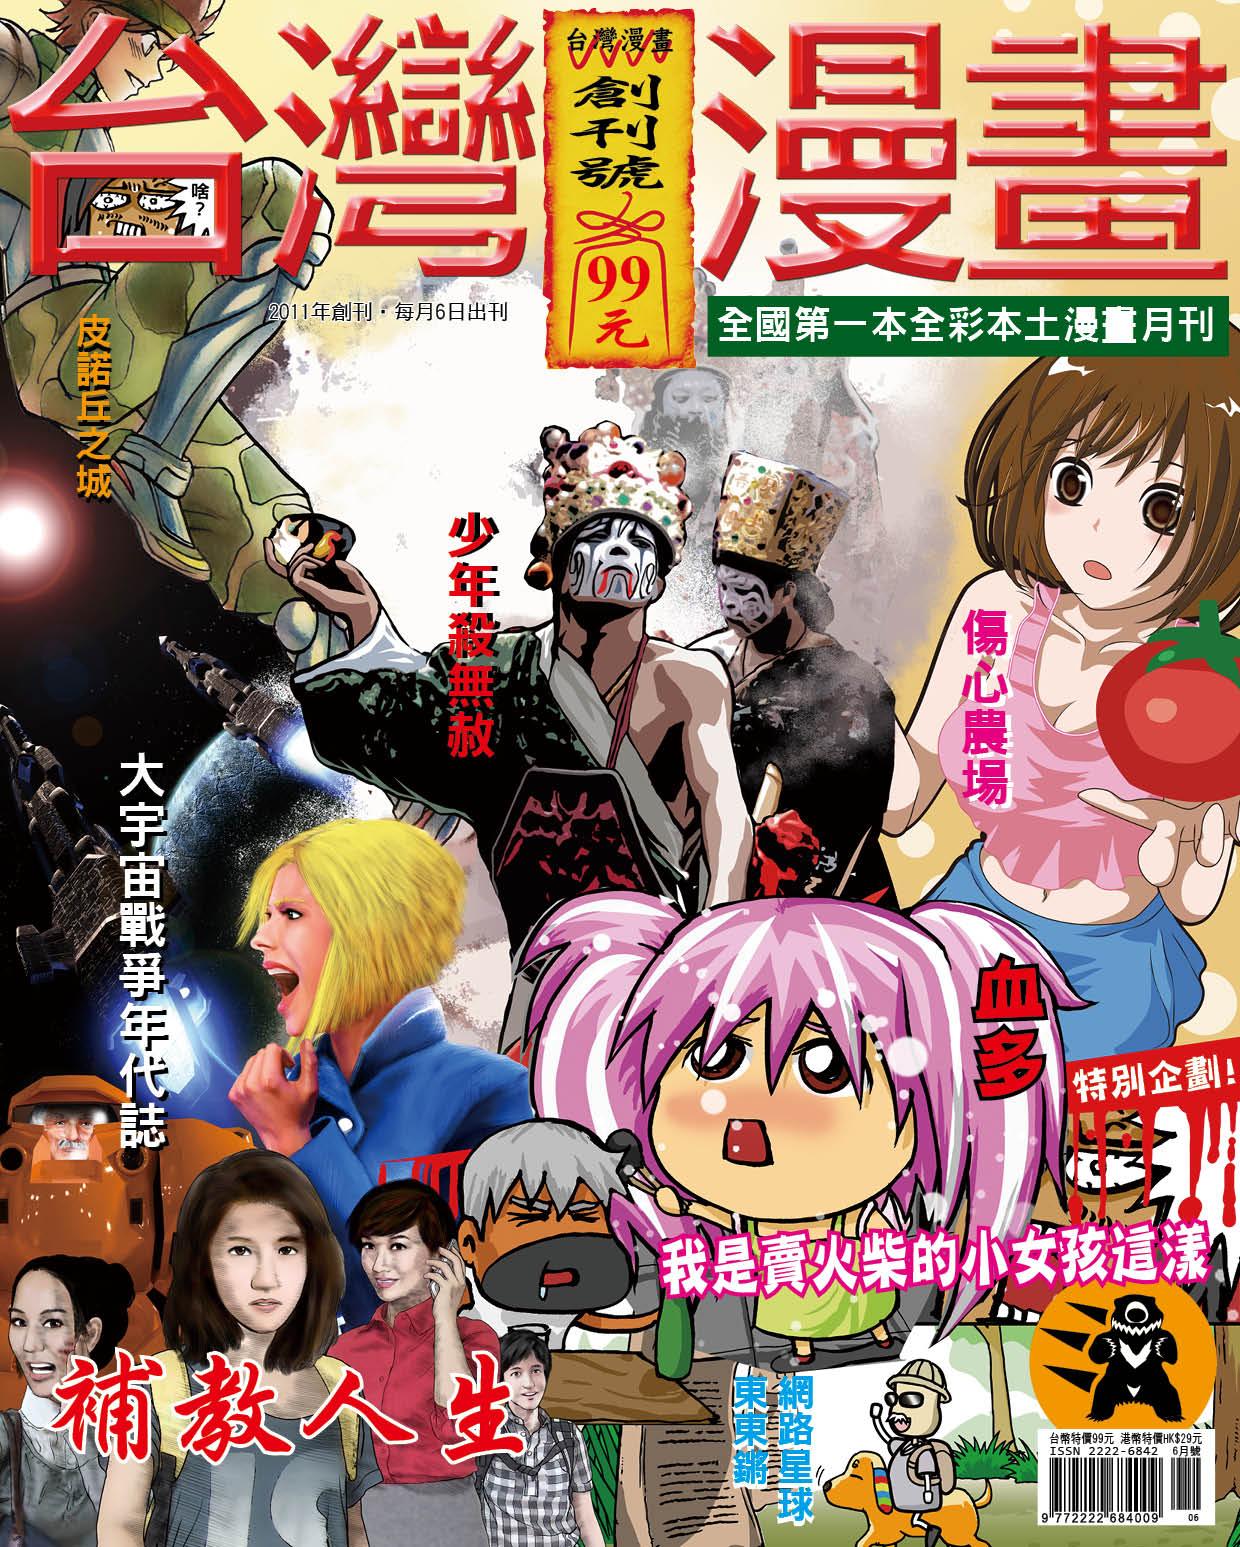 Mayshing Looks: 臺灣漫畫出版: 皮諾丘之城